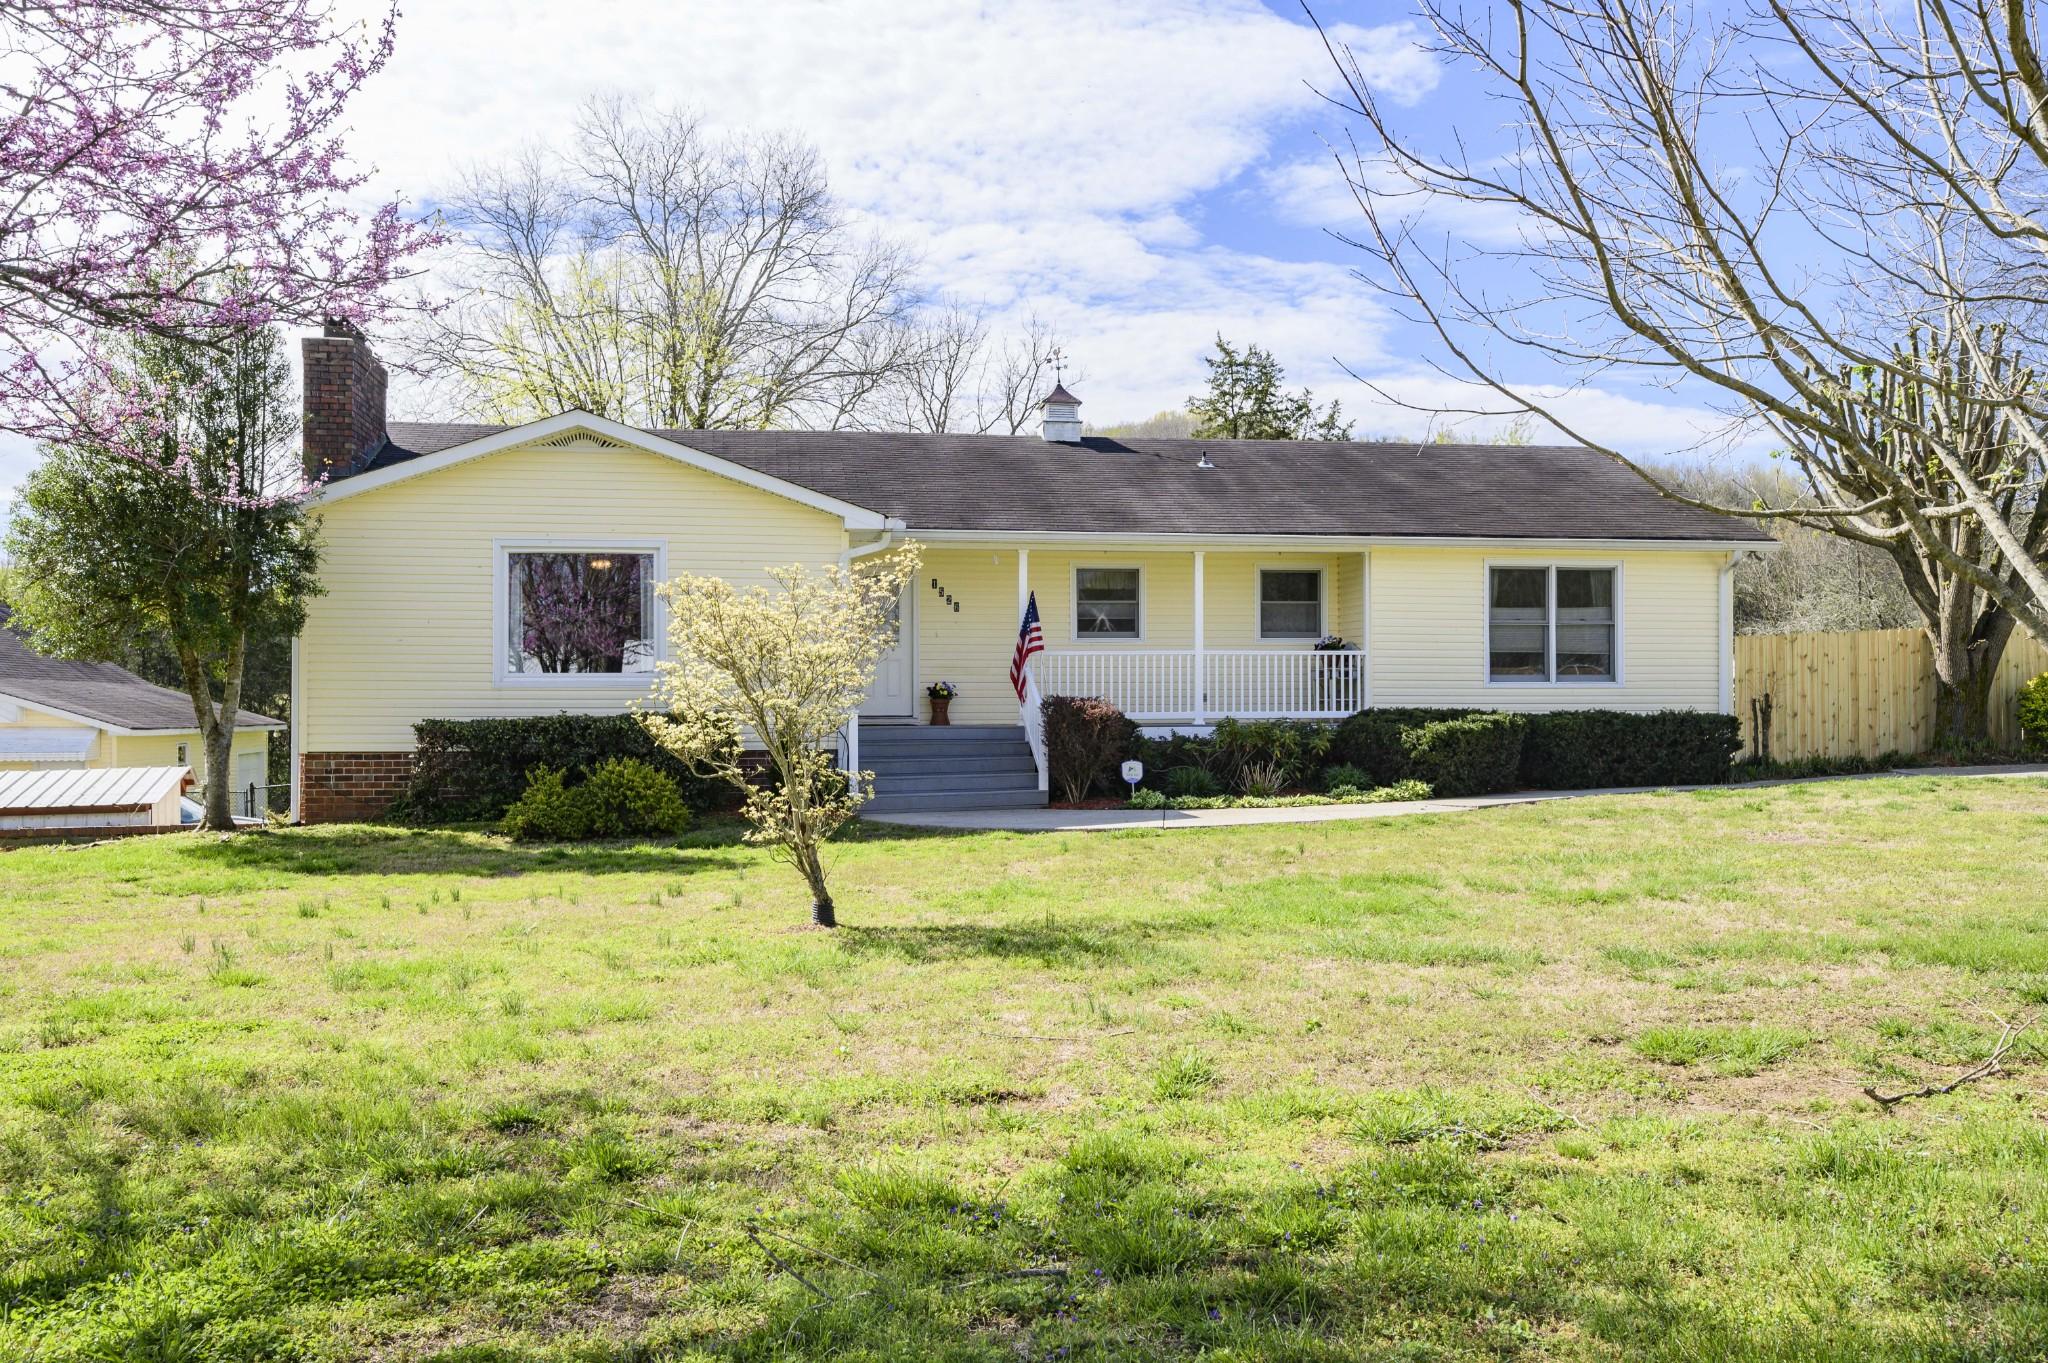 1526 Readyville St, Readyville, TN 37149 - Readyville, TN real estate listing